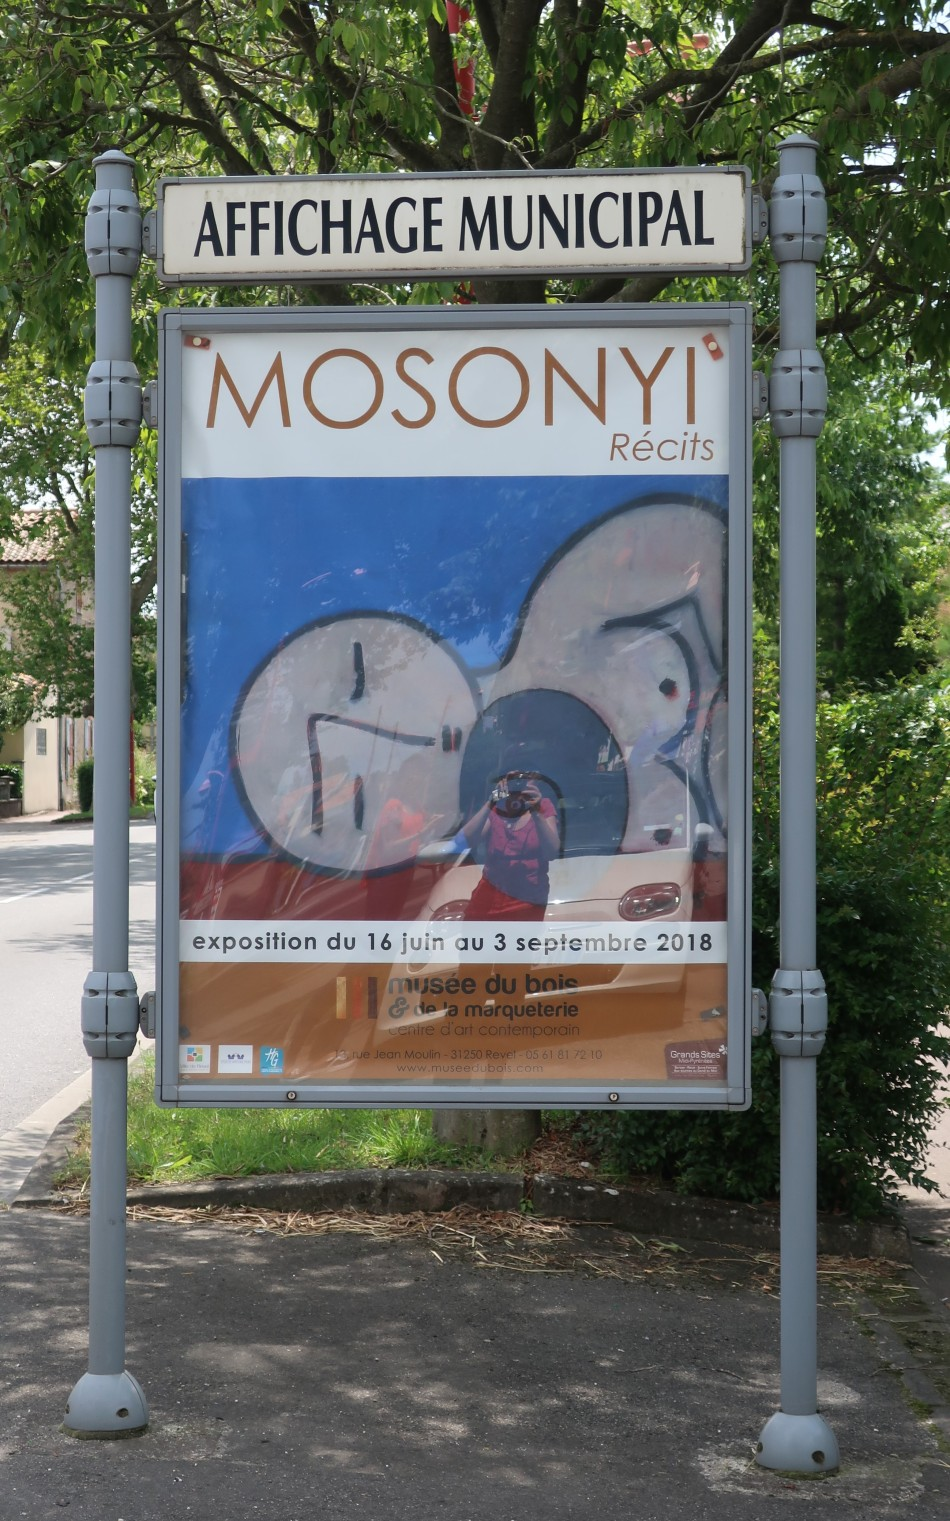 revel affichage municipal